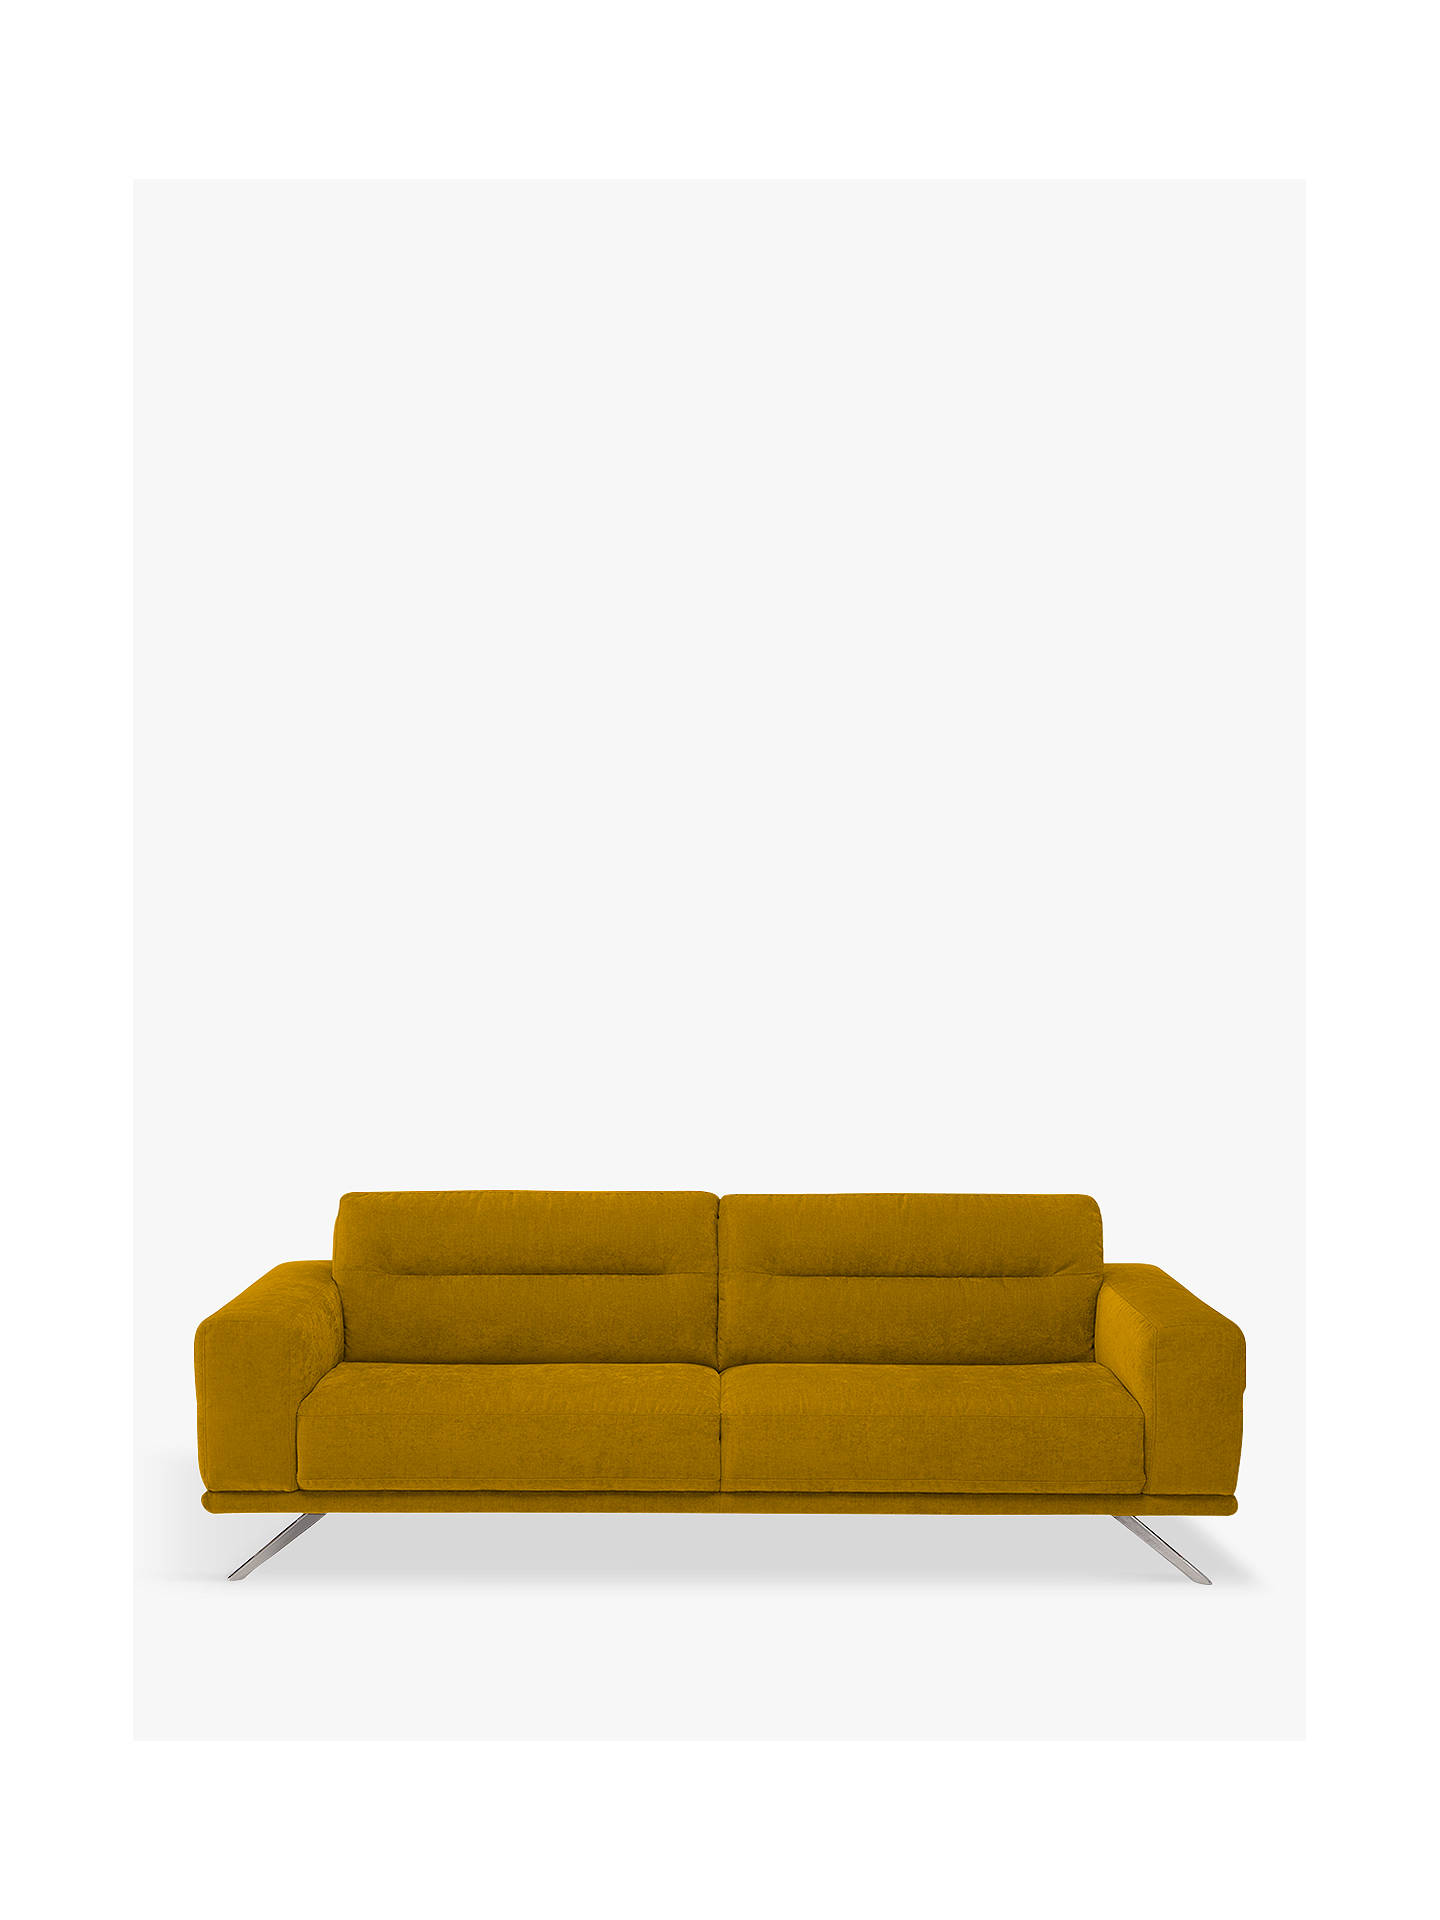 Natuzzi Timido 009 Large 3 Seater Fabric Sofa Nickel Leg Brezza Sunflower Online At